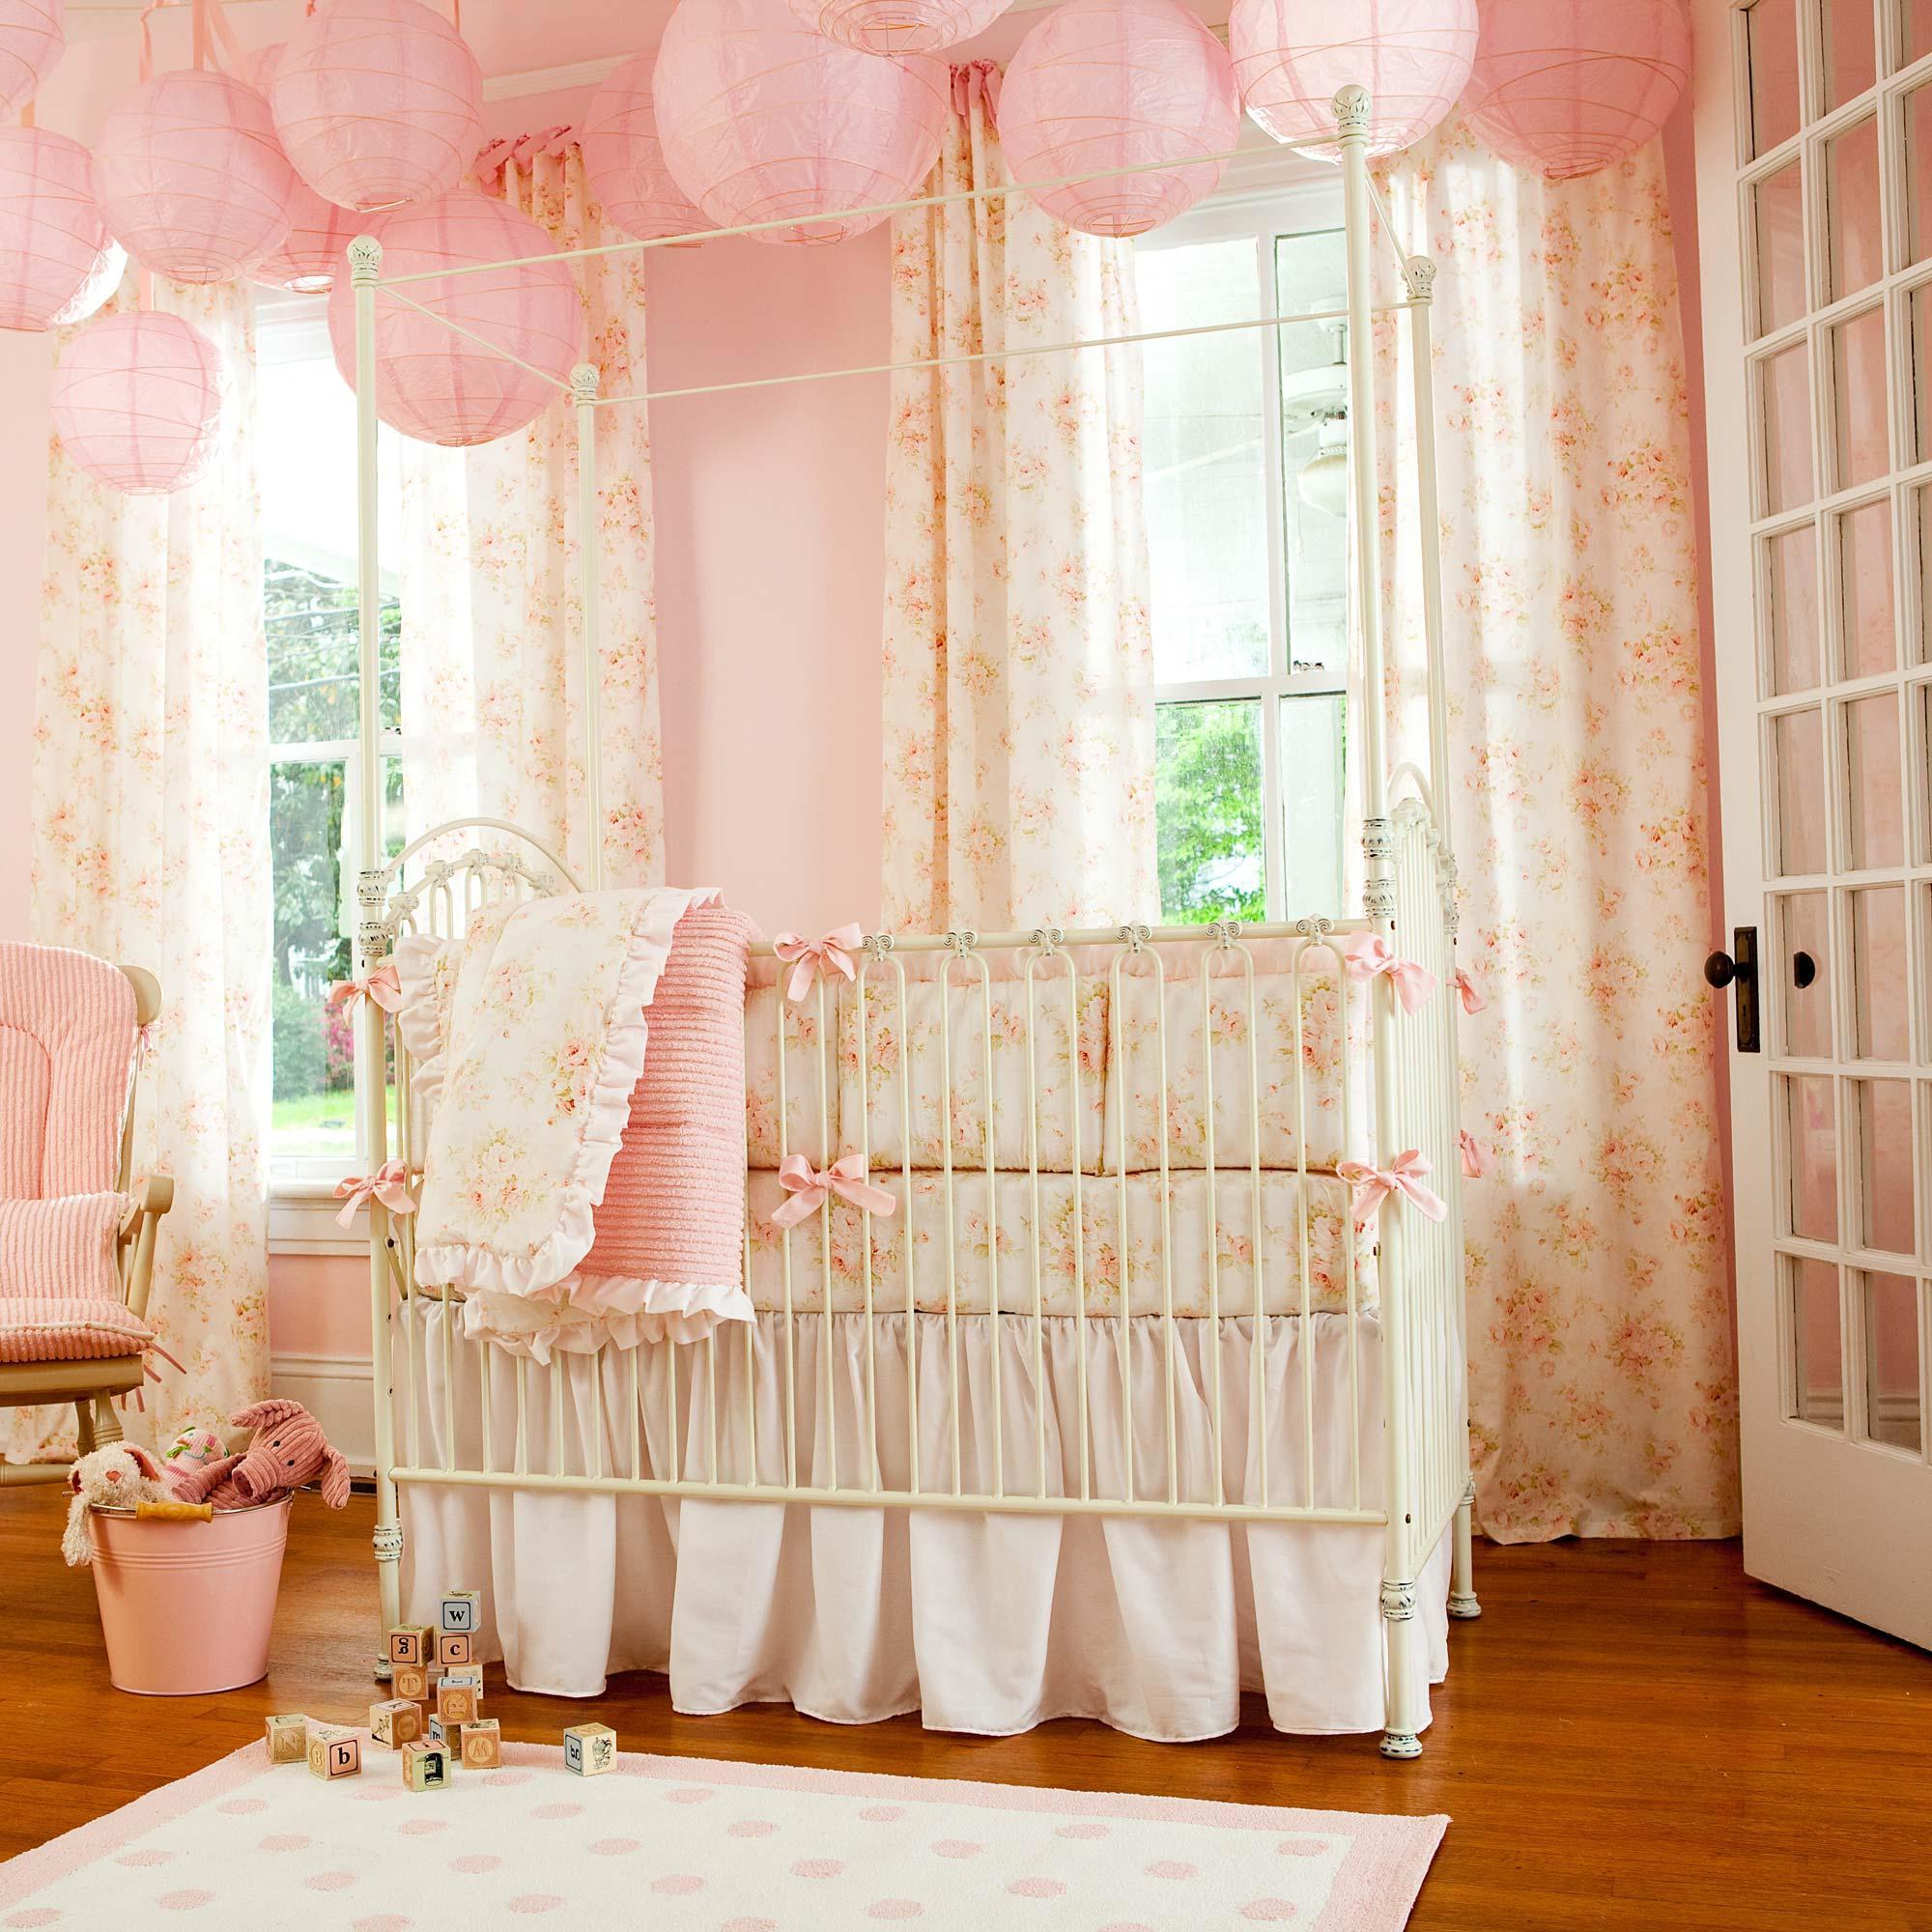 crib bedding for girls shabby chenille 3-piece crib bedding set IONPKER